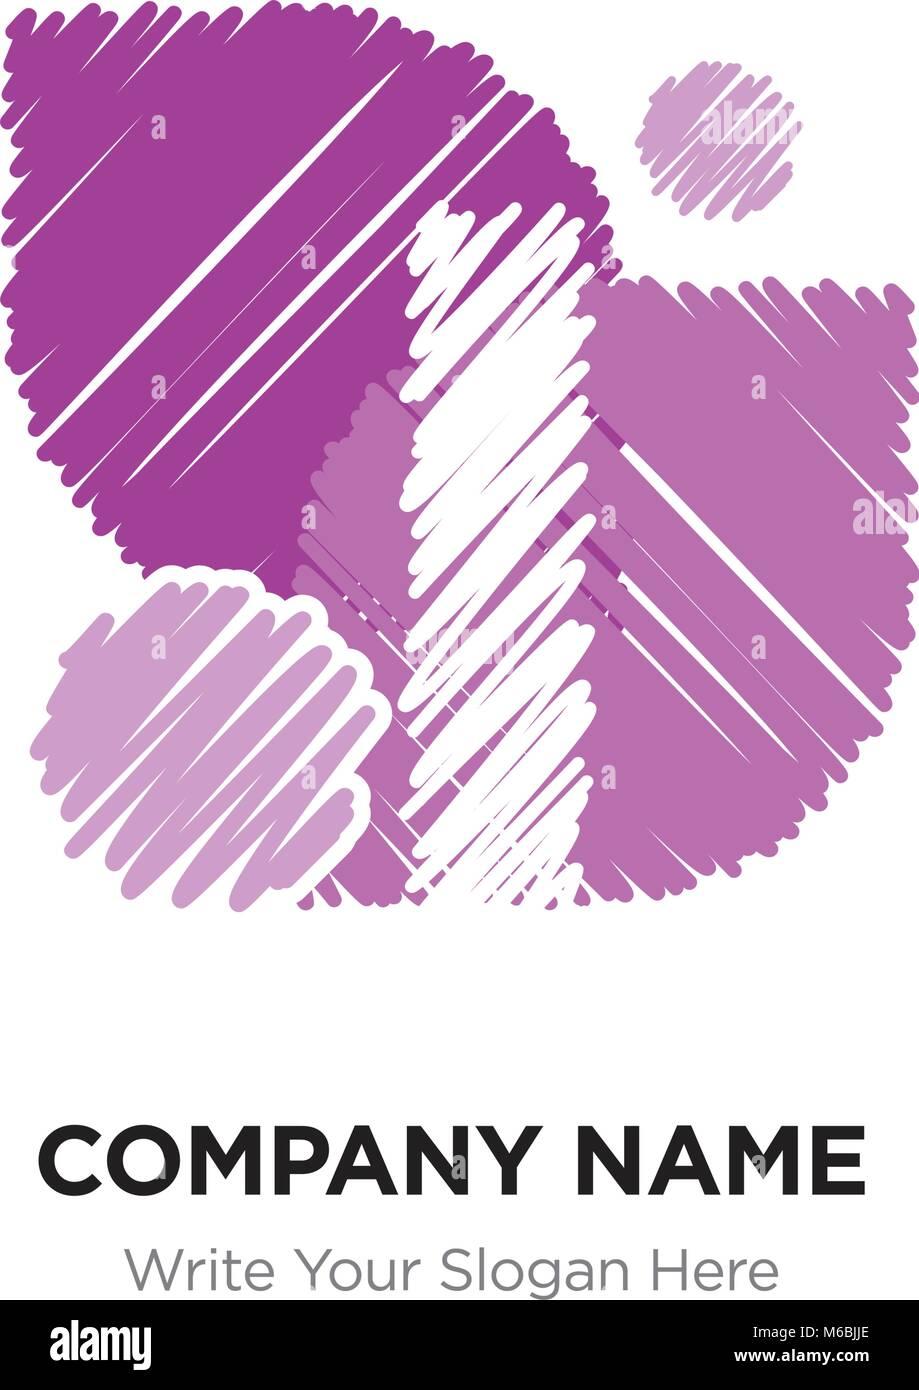 Letter I Vectors Stock Photos & Letter I Vectors Stock Images - Alamy